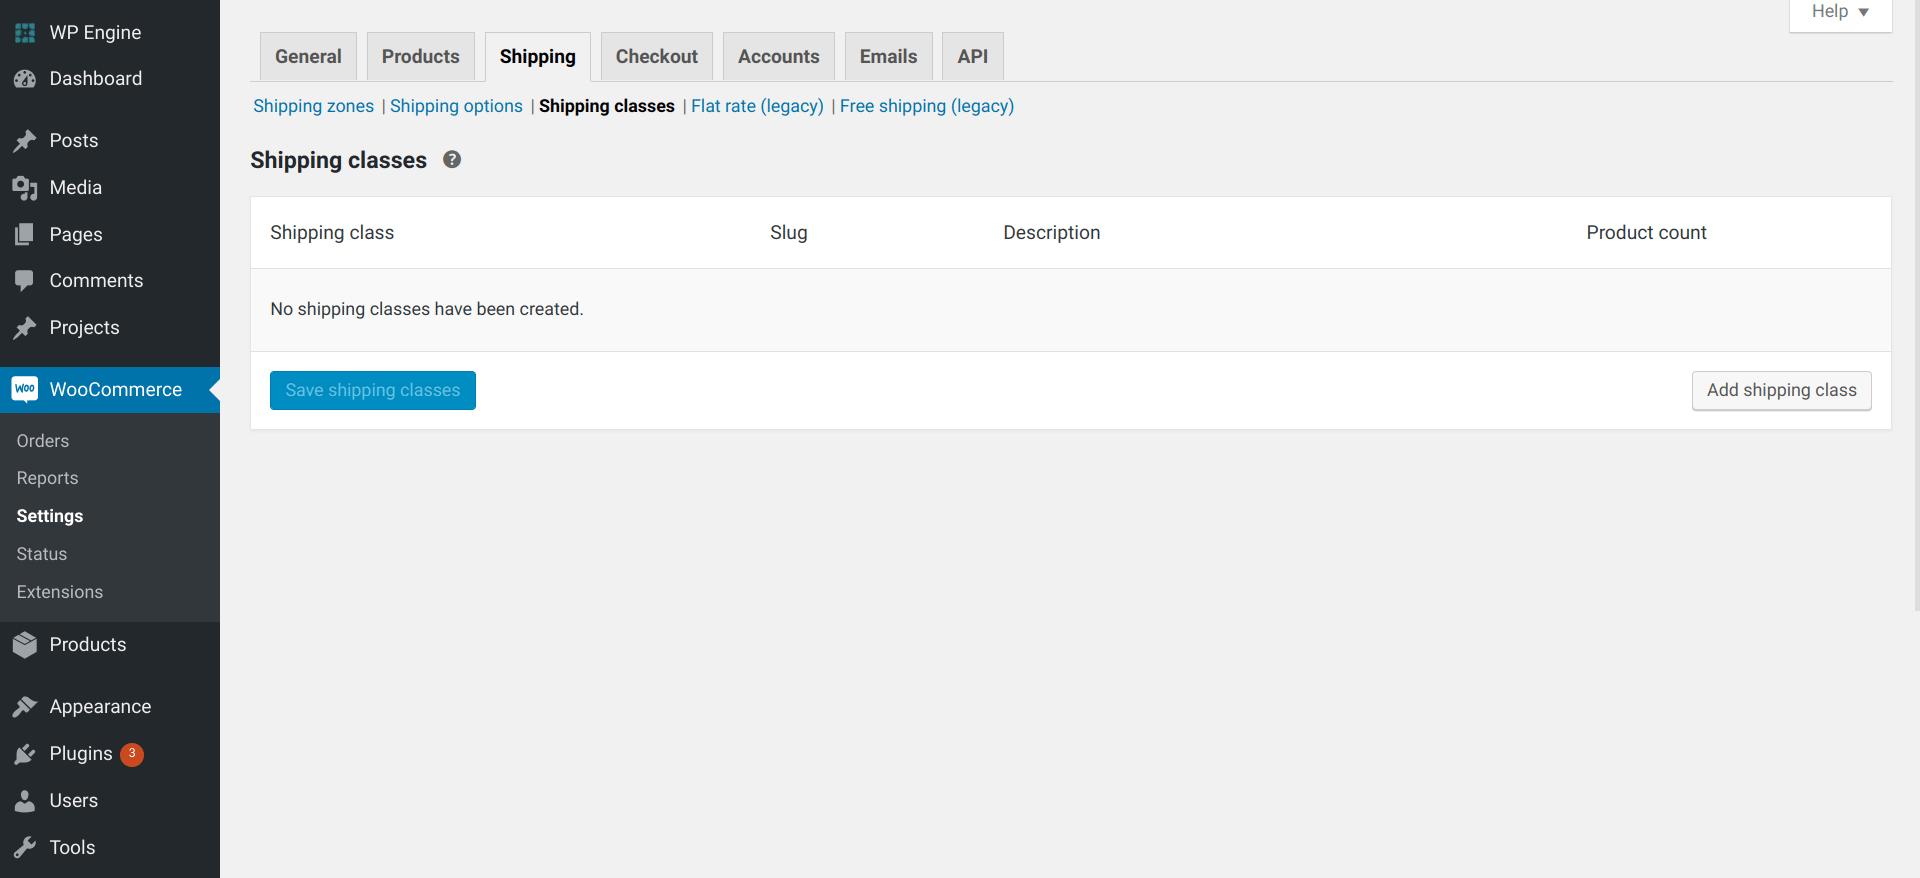 woocommerce shipping - Add Shipping Class screen